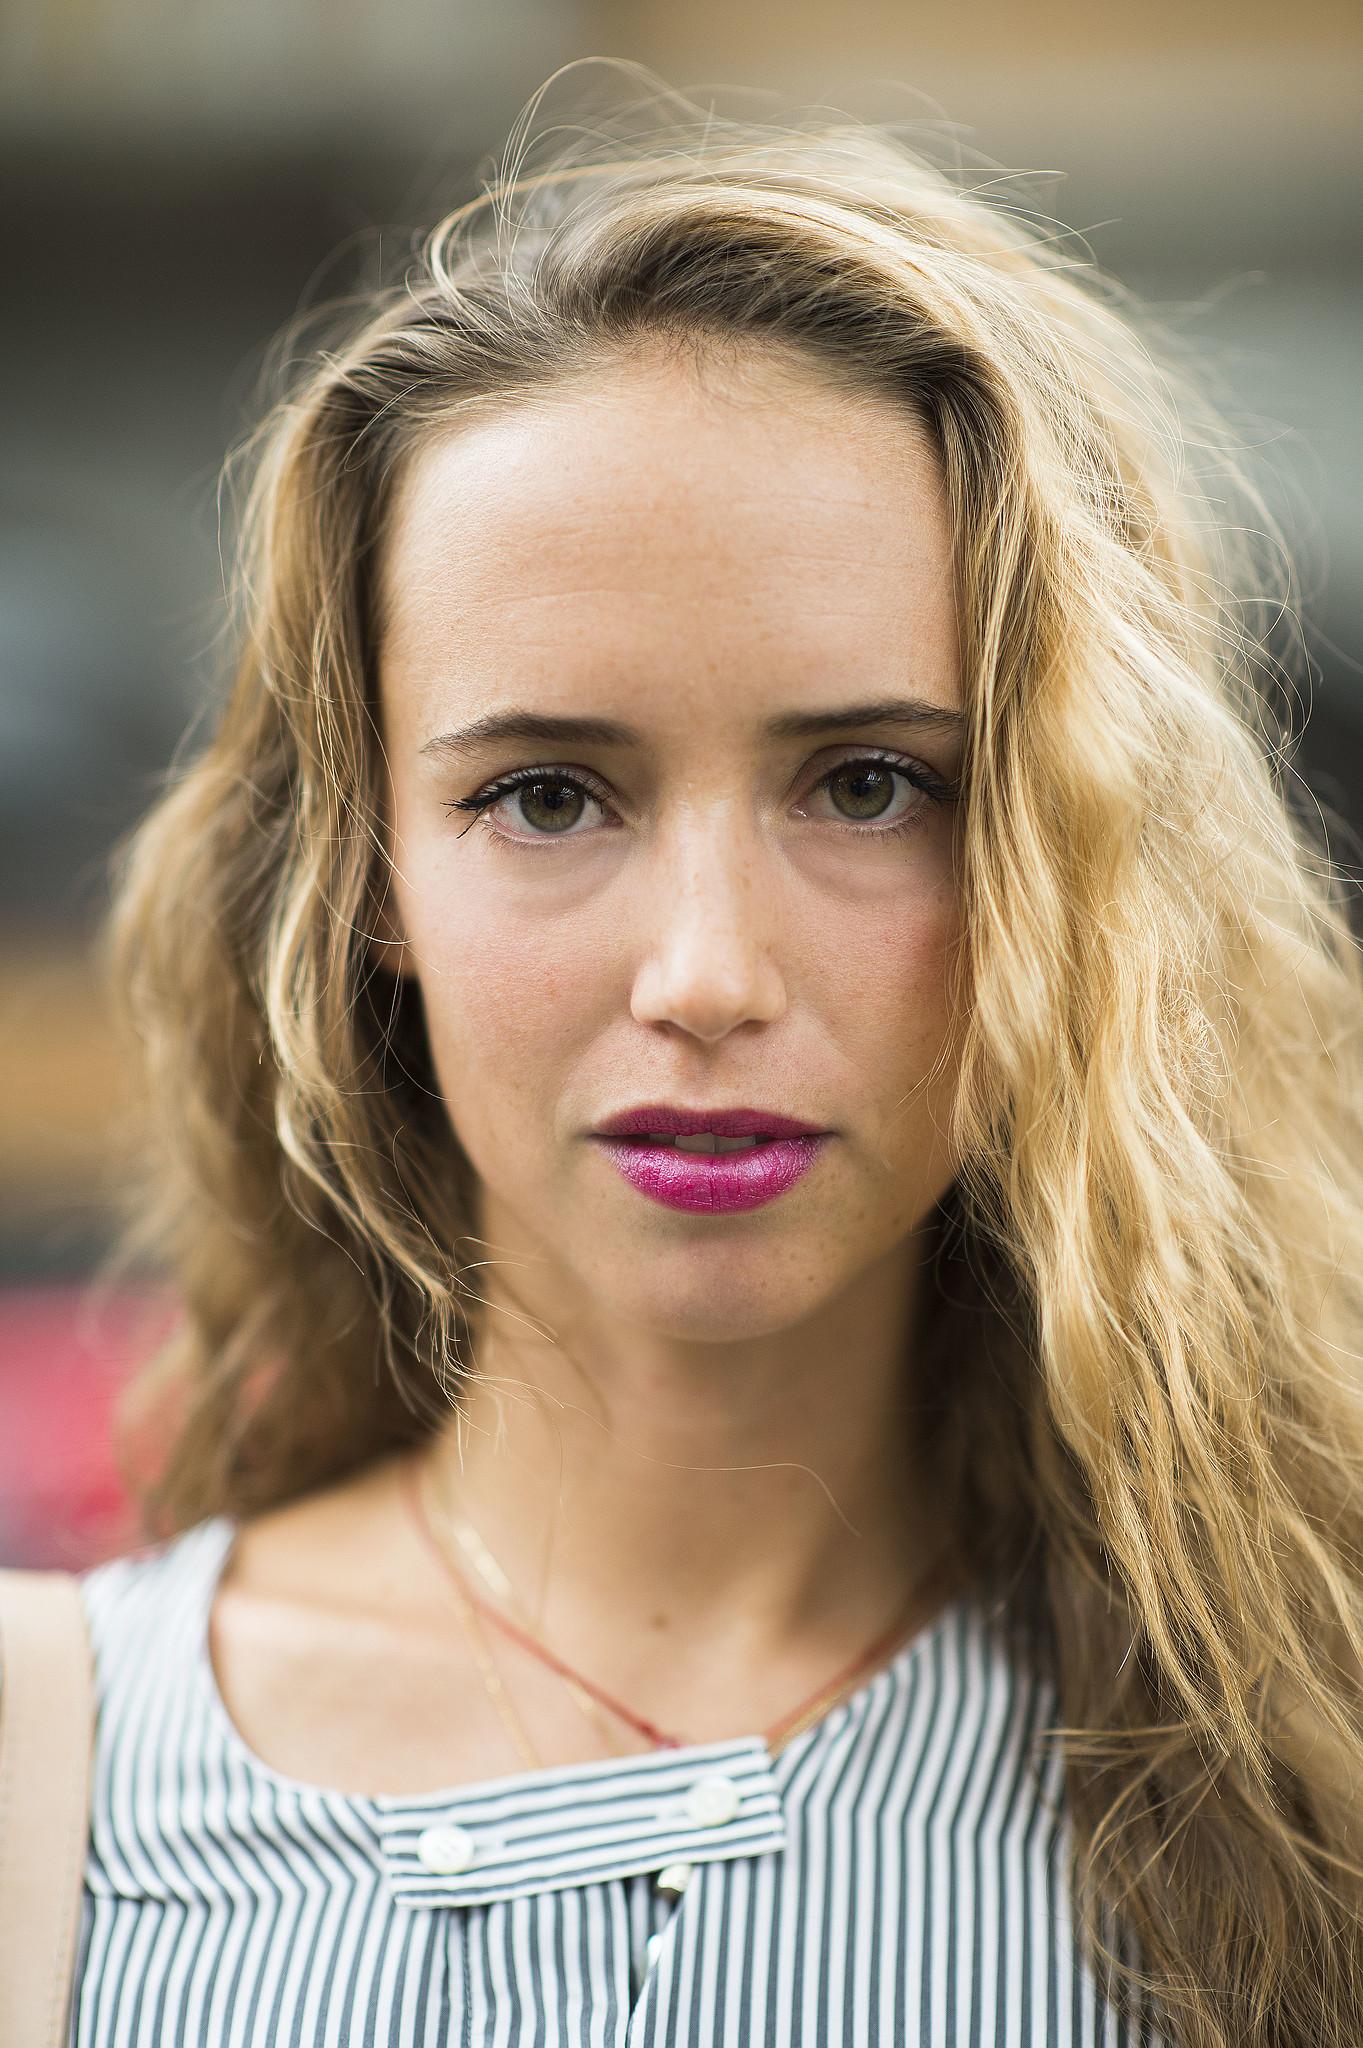 Bright magenta lipstick is always a good look. Source: Le 21ème   Adam Katz Sinding